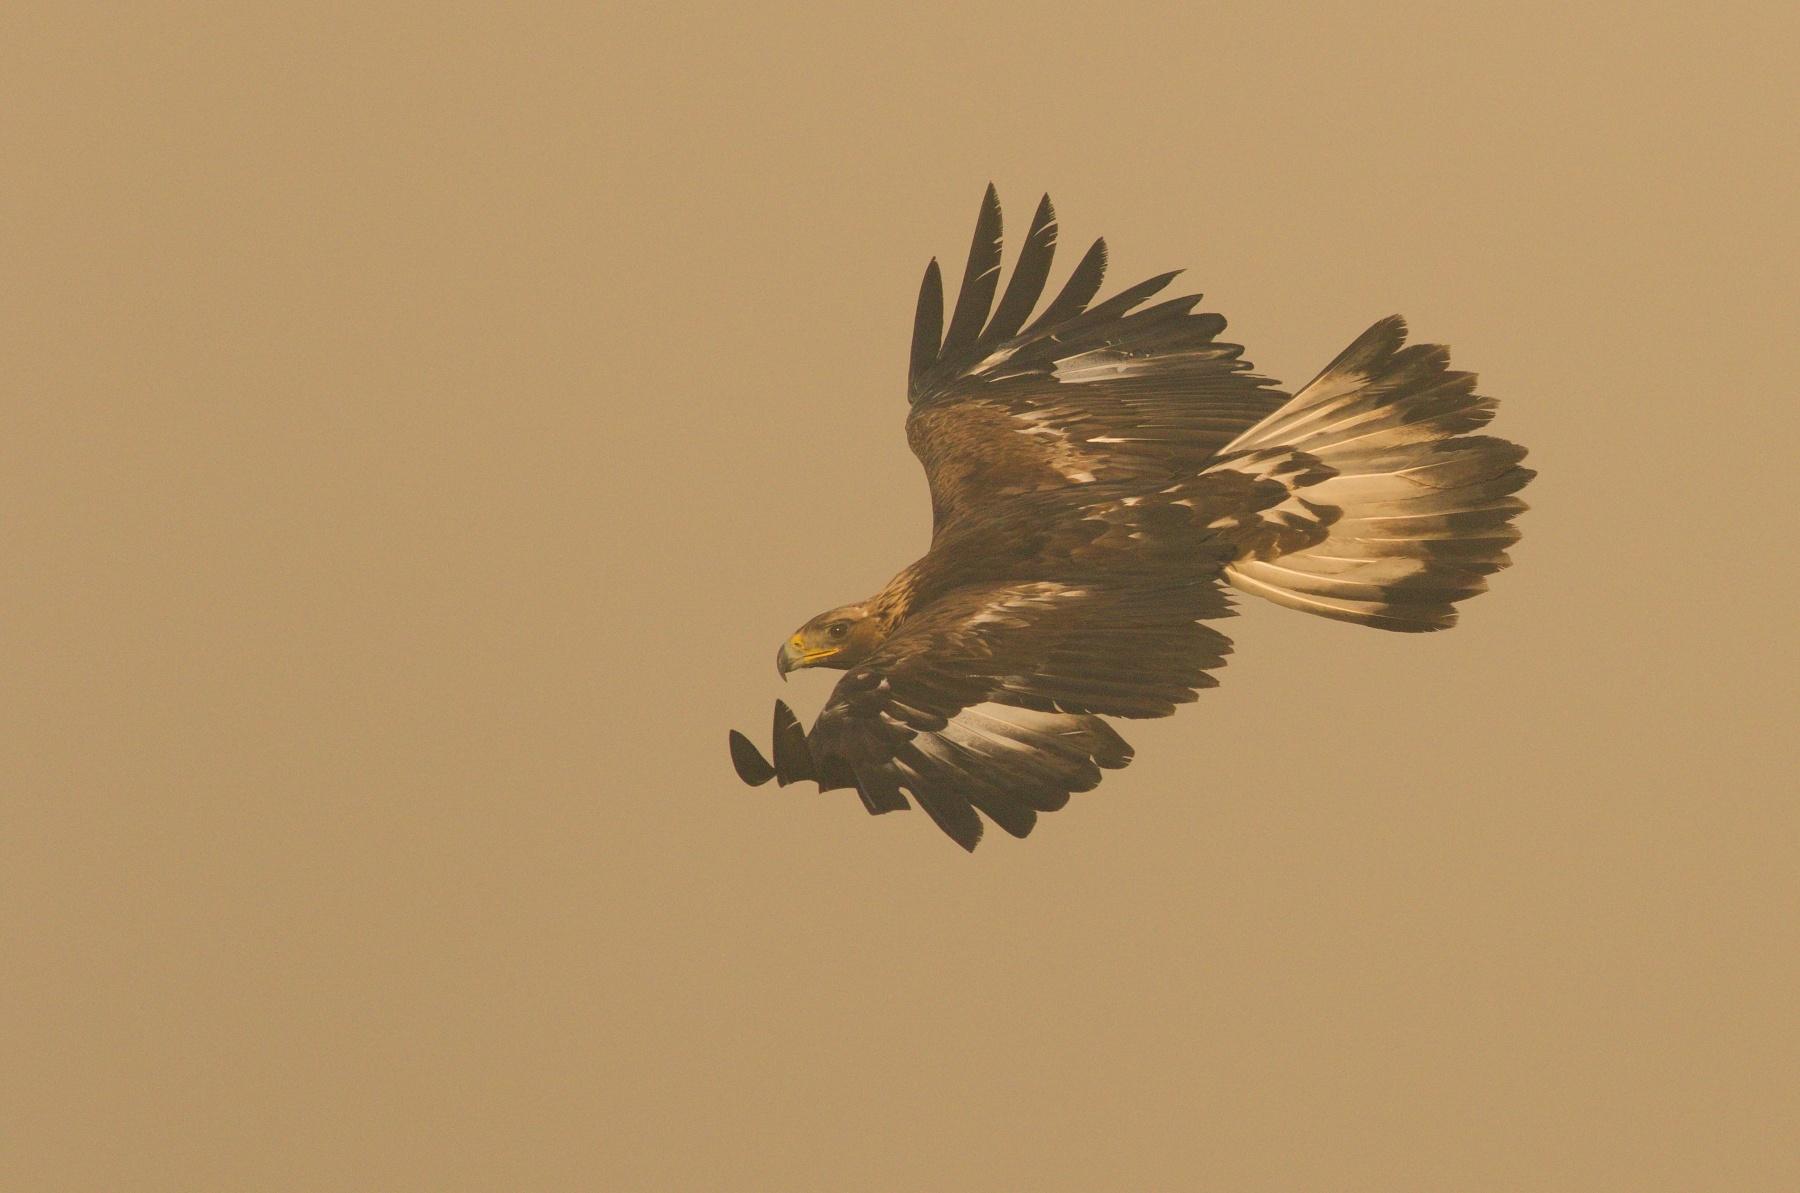 orol skalný (Aquila chrysaetos) Golden eagle, Liptov, Slovensko Canon EOS 7d mark II, Canon 400 mm f5.6 L USM, f7.1, 1/2000, ISO 500, 28. apríl 2018